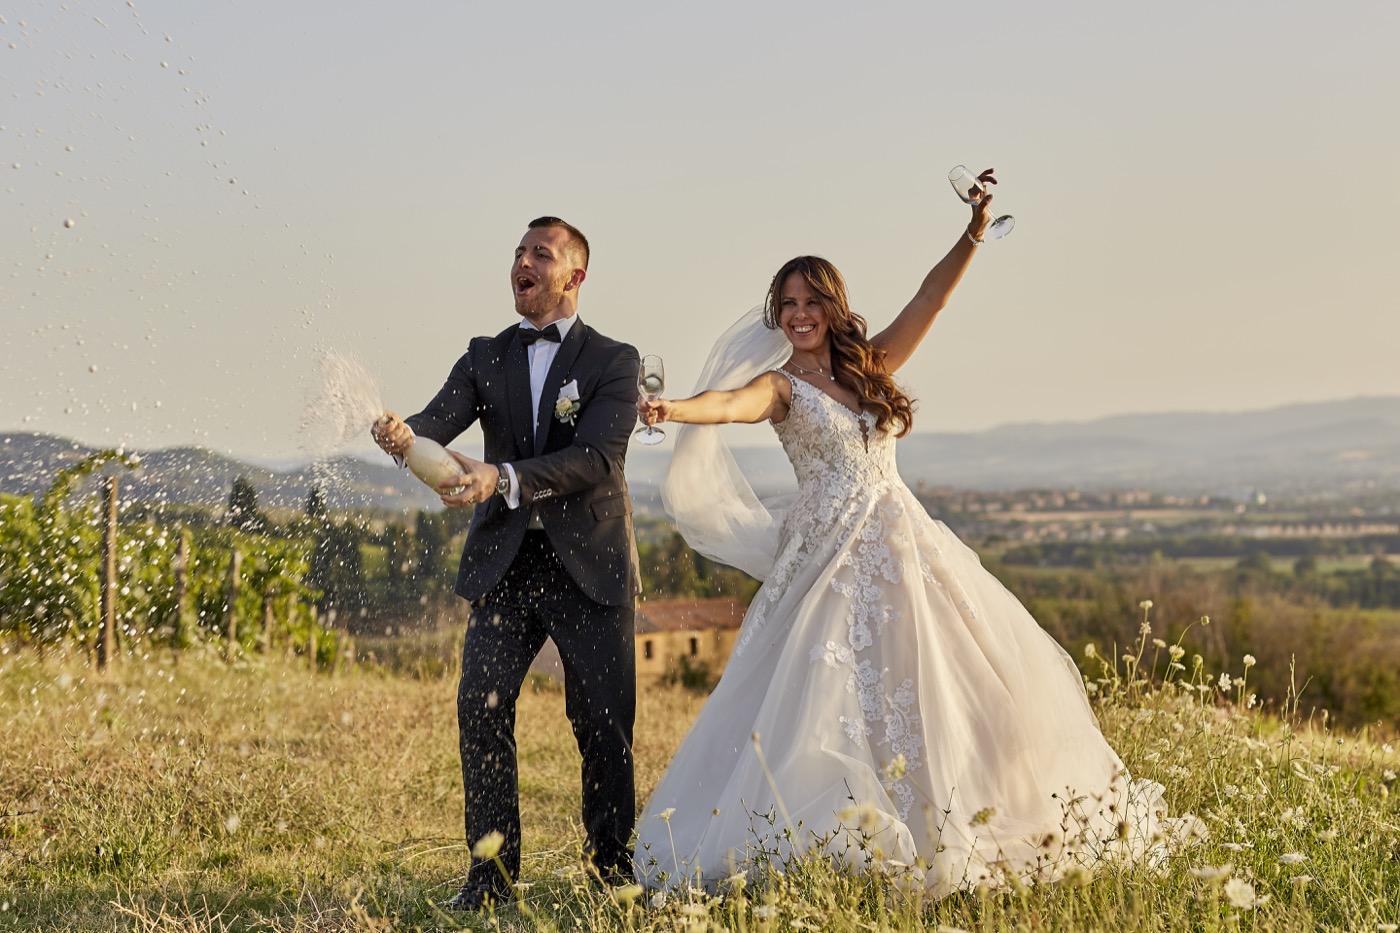 Claudio-Coppola-wedding-photographer-la-scuderia-eventi-preparativi-la-rosetta-perugia-71